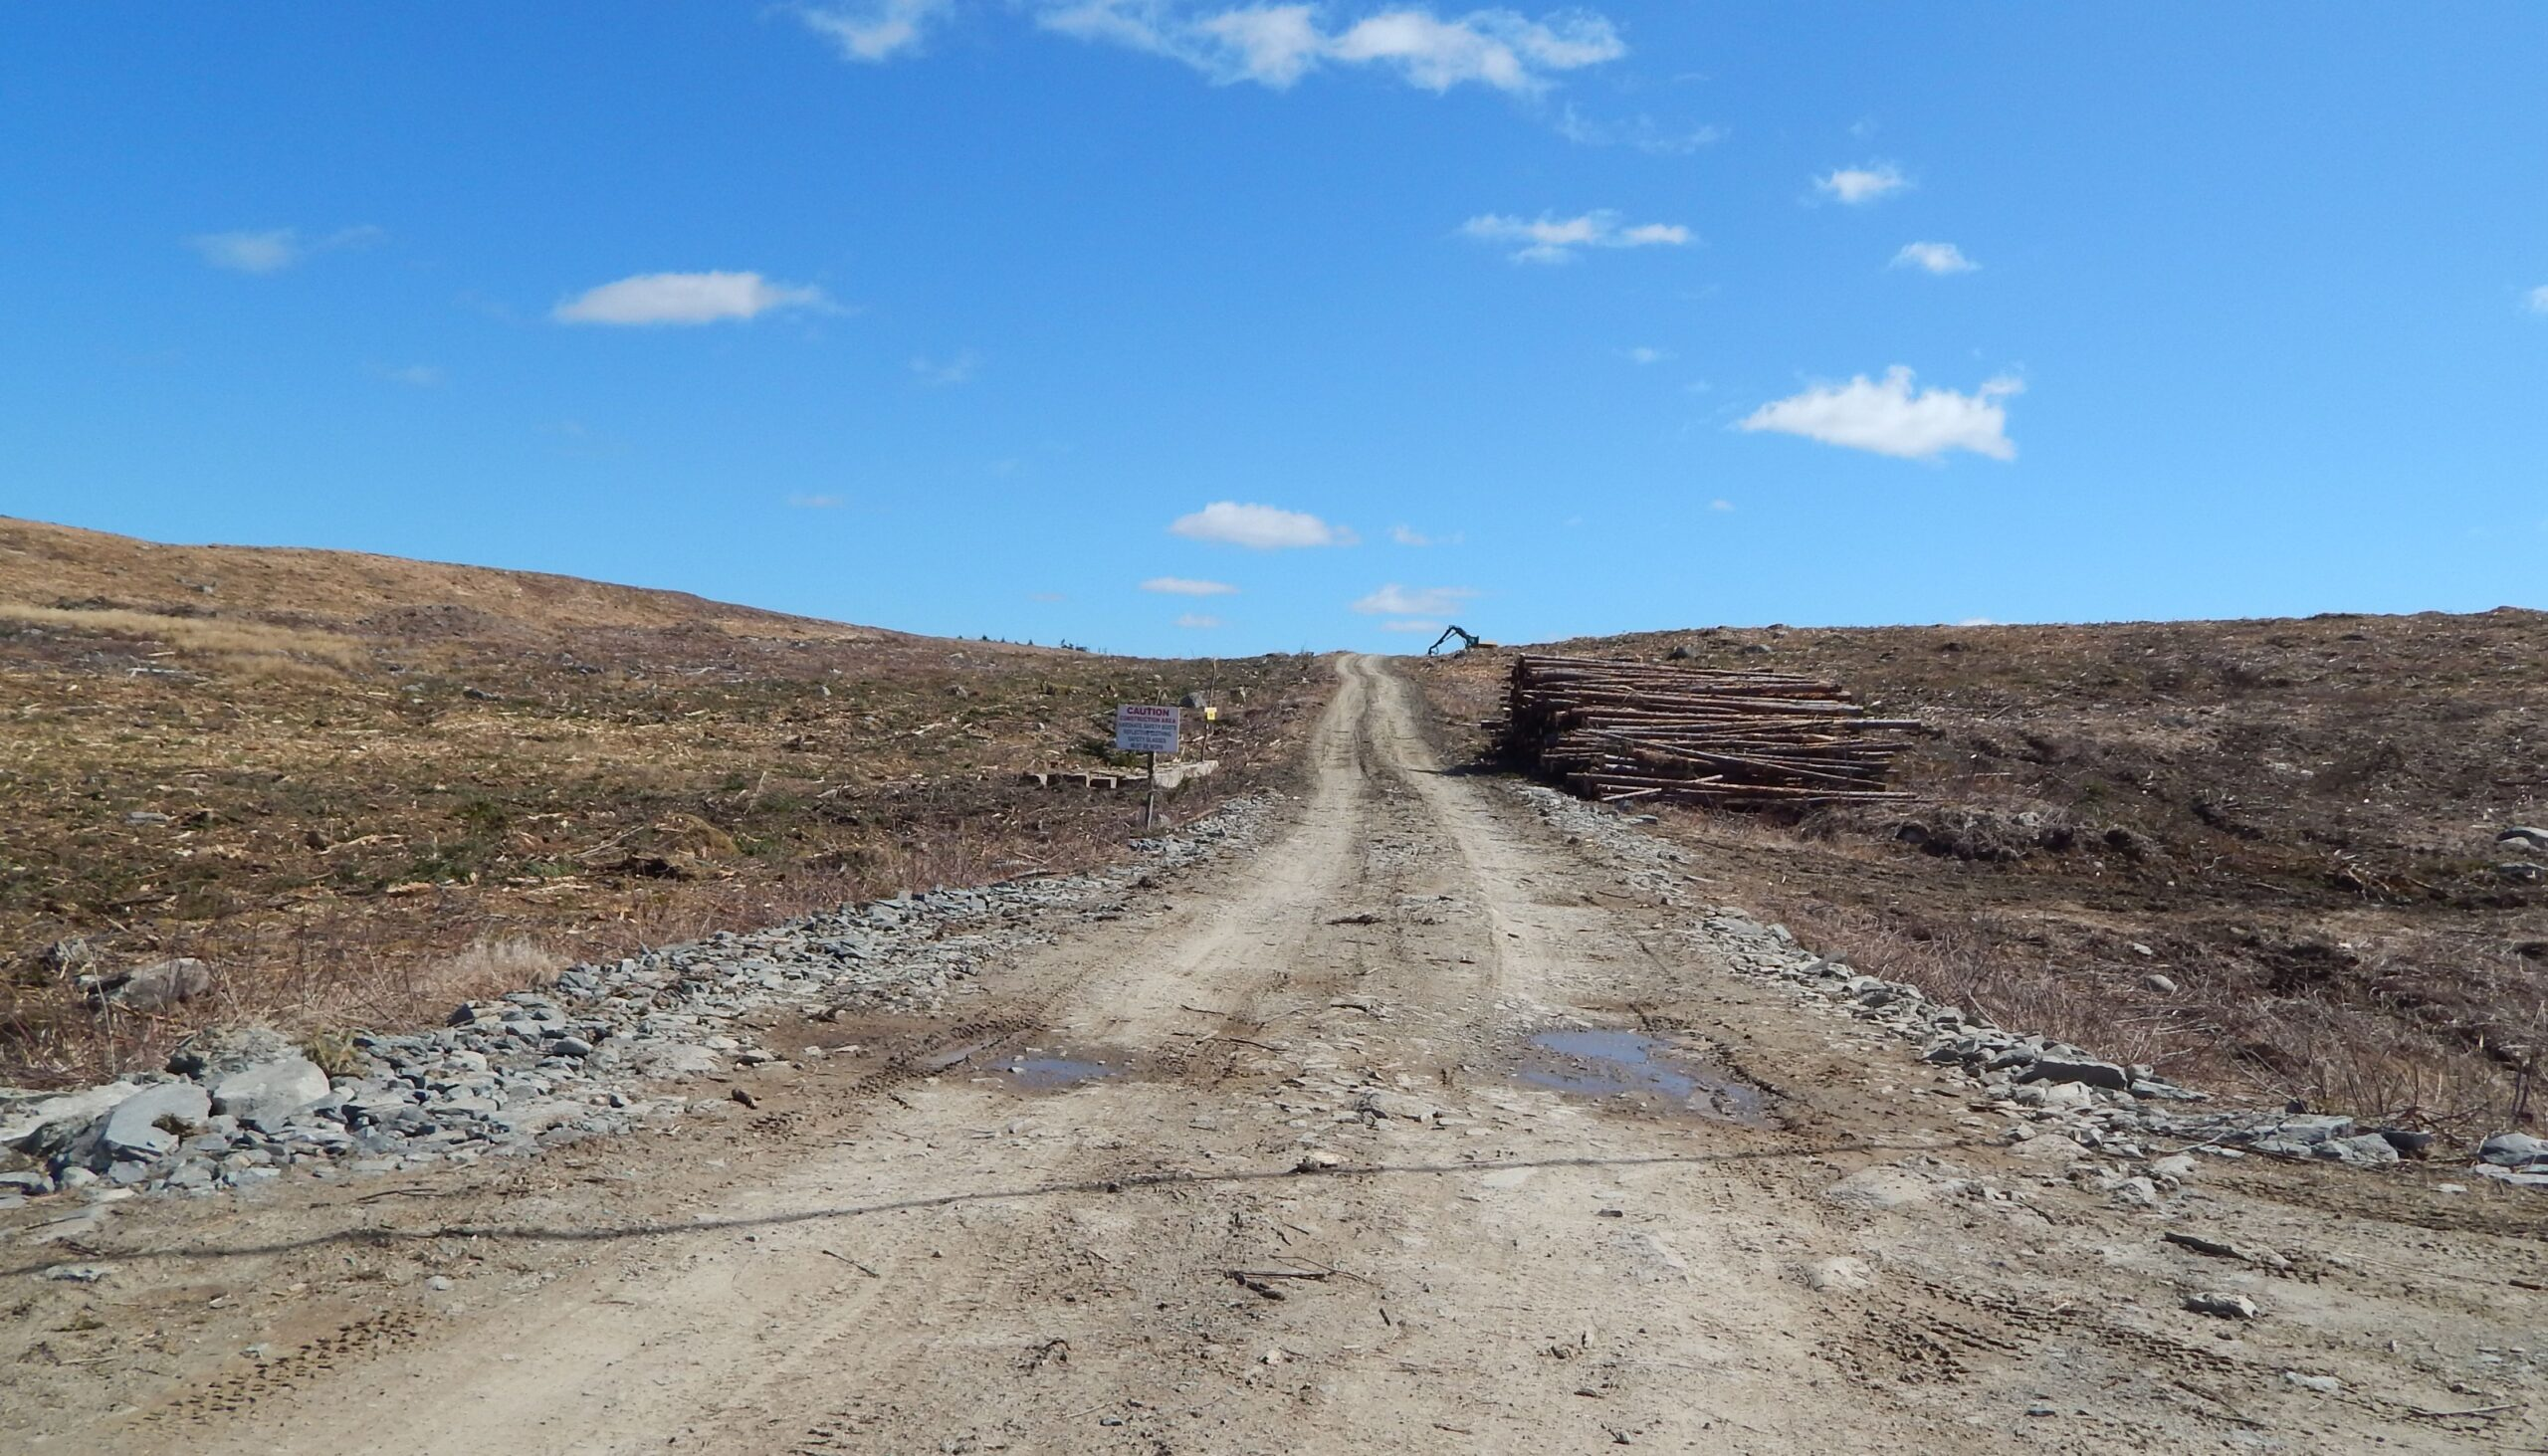 A dirt road through scrabbly wilderness